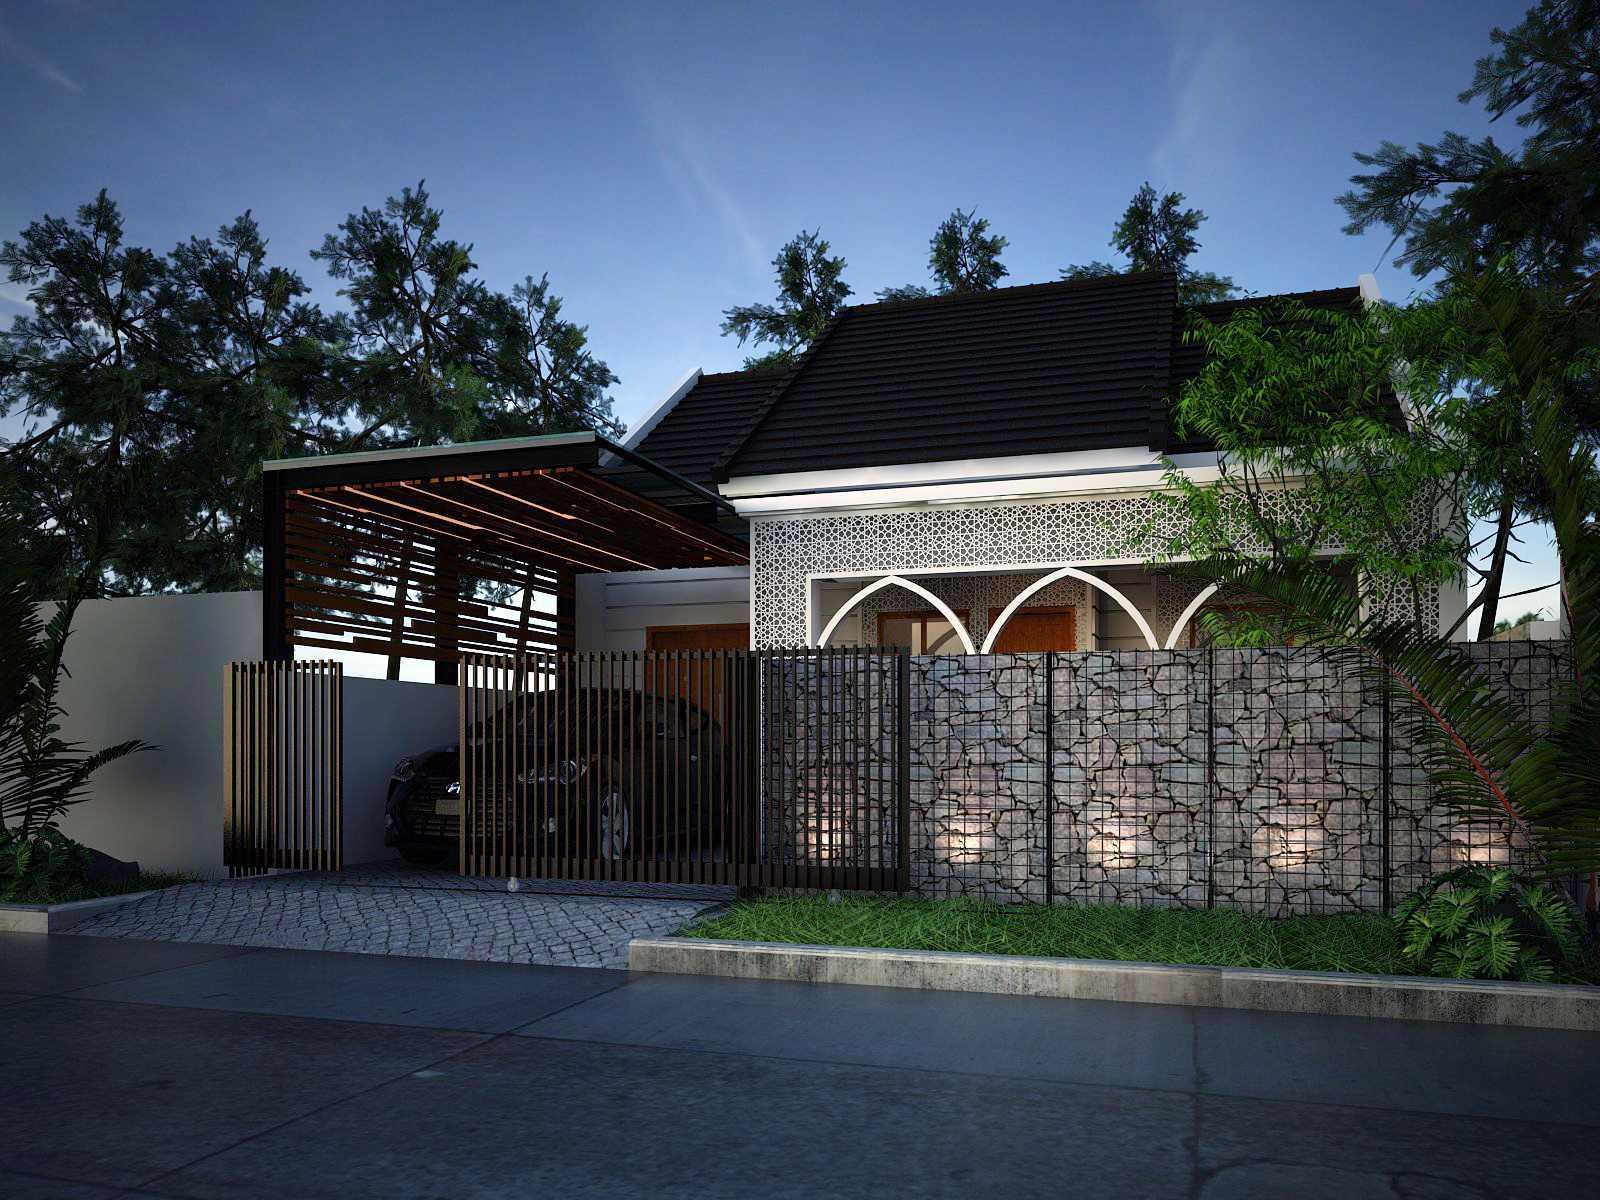 Firman Wiratama Arabian House House Manukan Kulon, Kec. Tandes, Kota Sby, Jawa Timur, Indonesia Manukan Kulon, Kec. Tandes, Kota Sby, Jawa Timur, Indonesia Firman-Wiratama-Arabian-House-House   76194